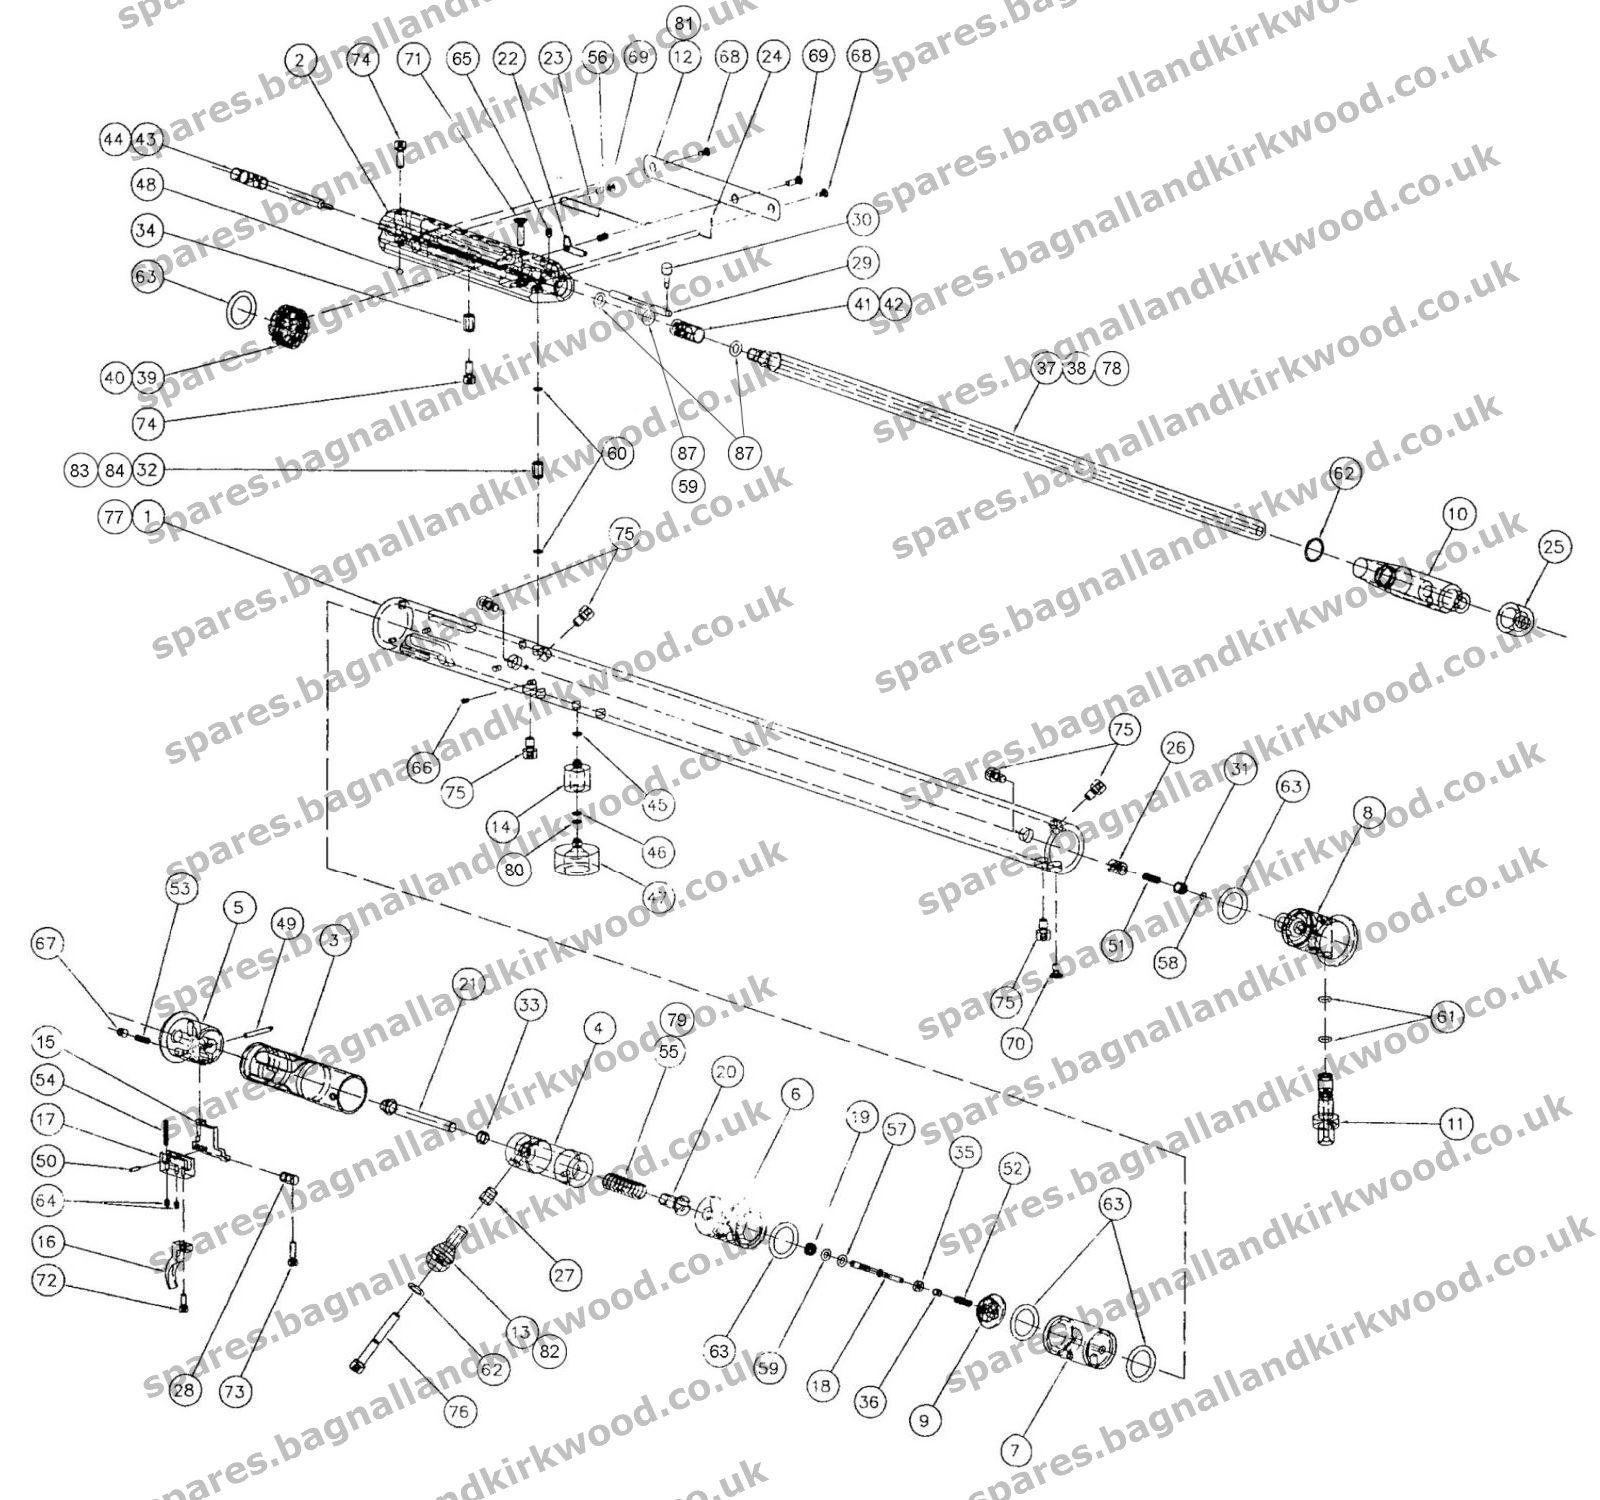 Vw Passat W8 Engine Diagram